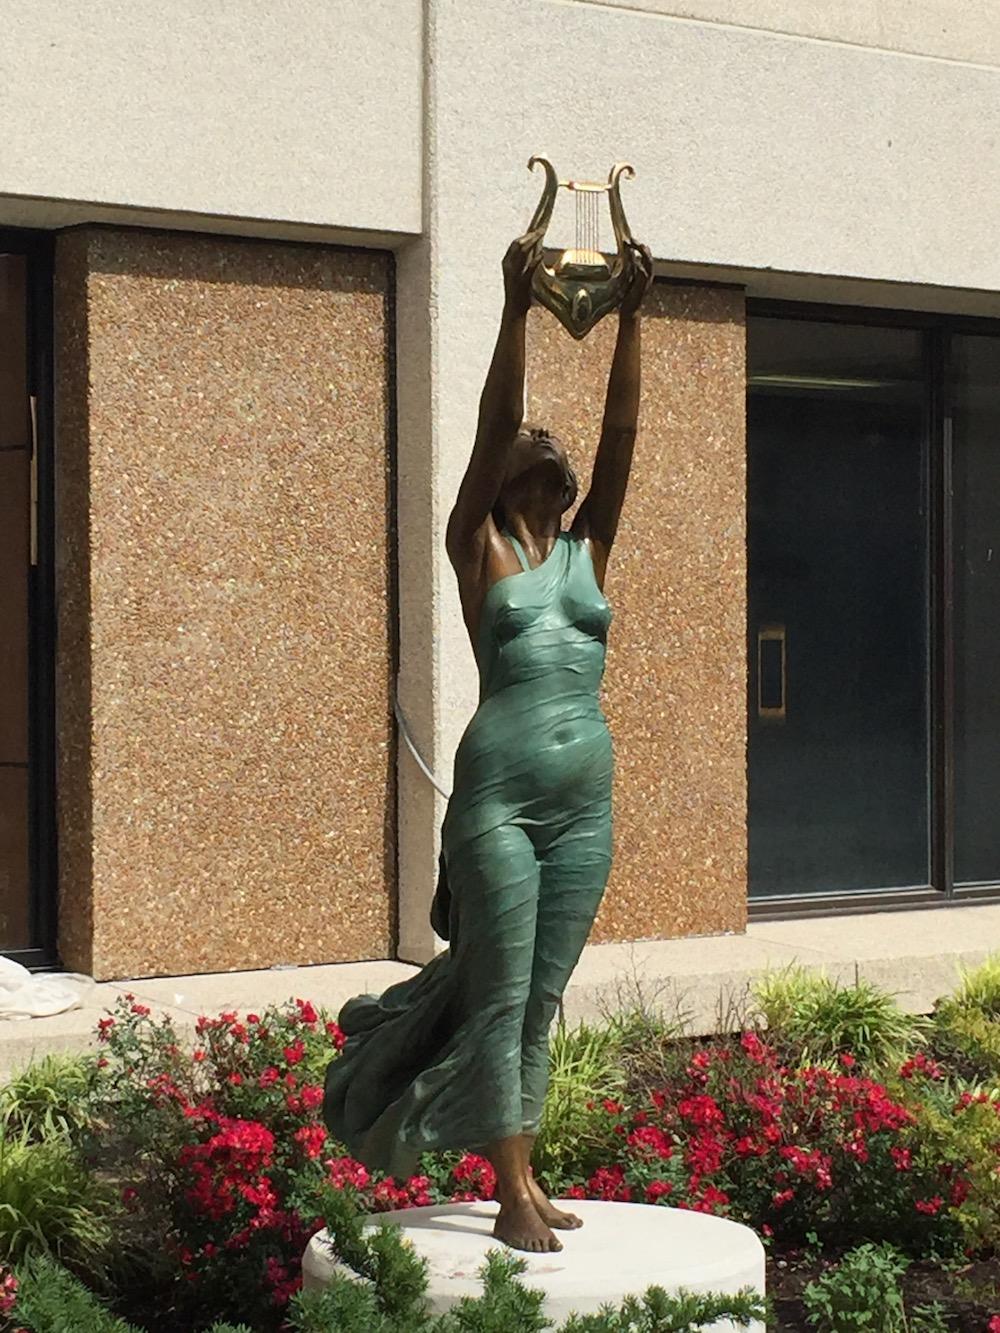 Euterpe's Gift  -6'9 X 41 X 27 in cast bronze (2016) on campus of IUSB